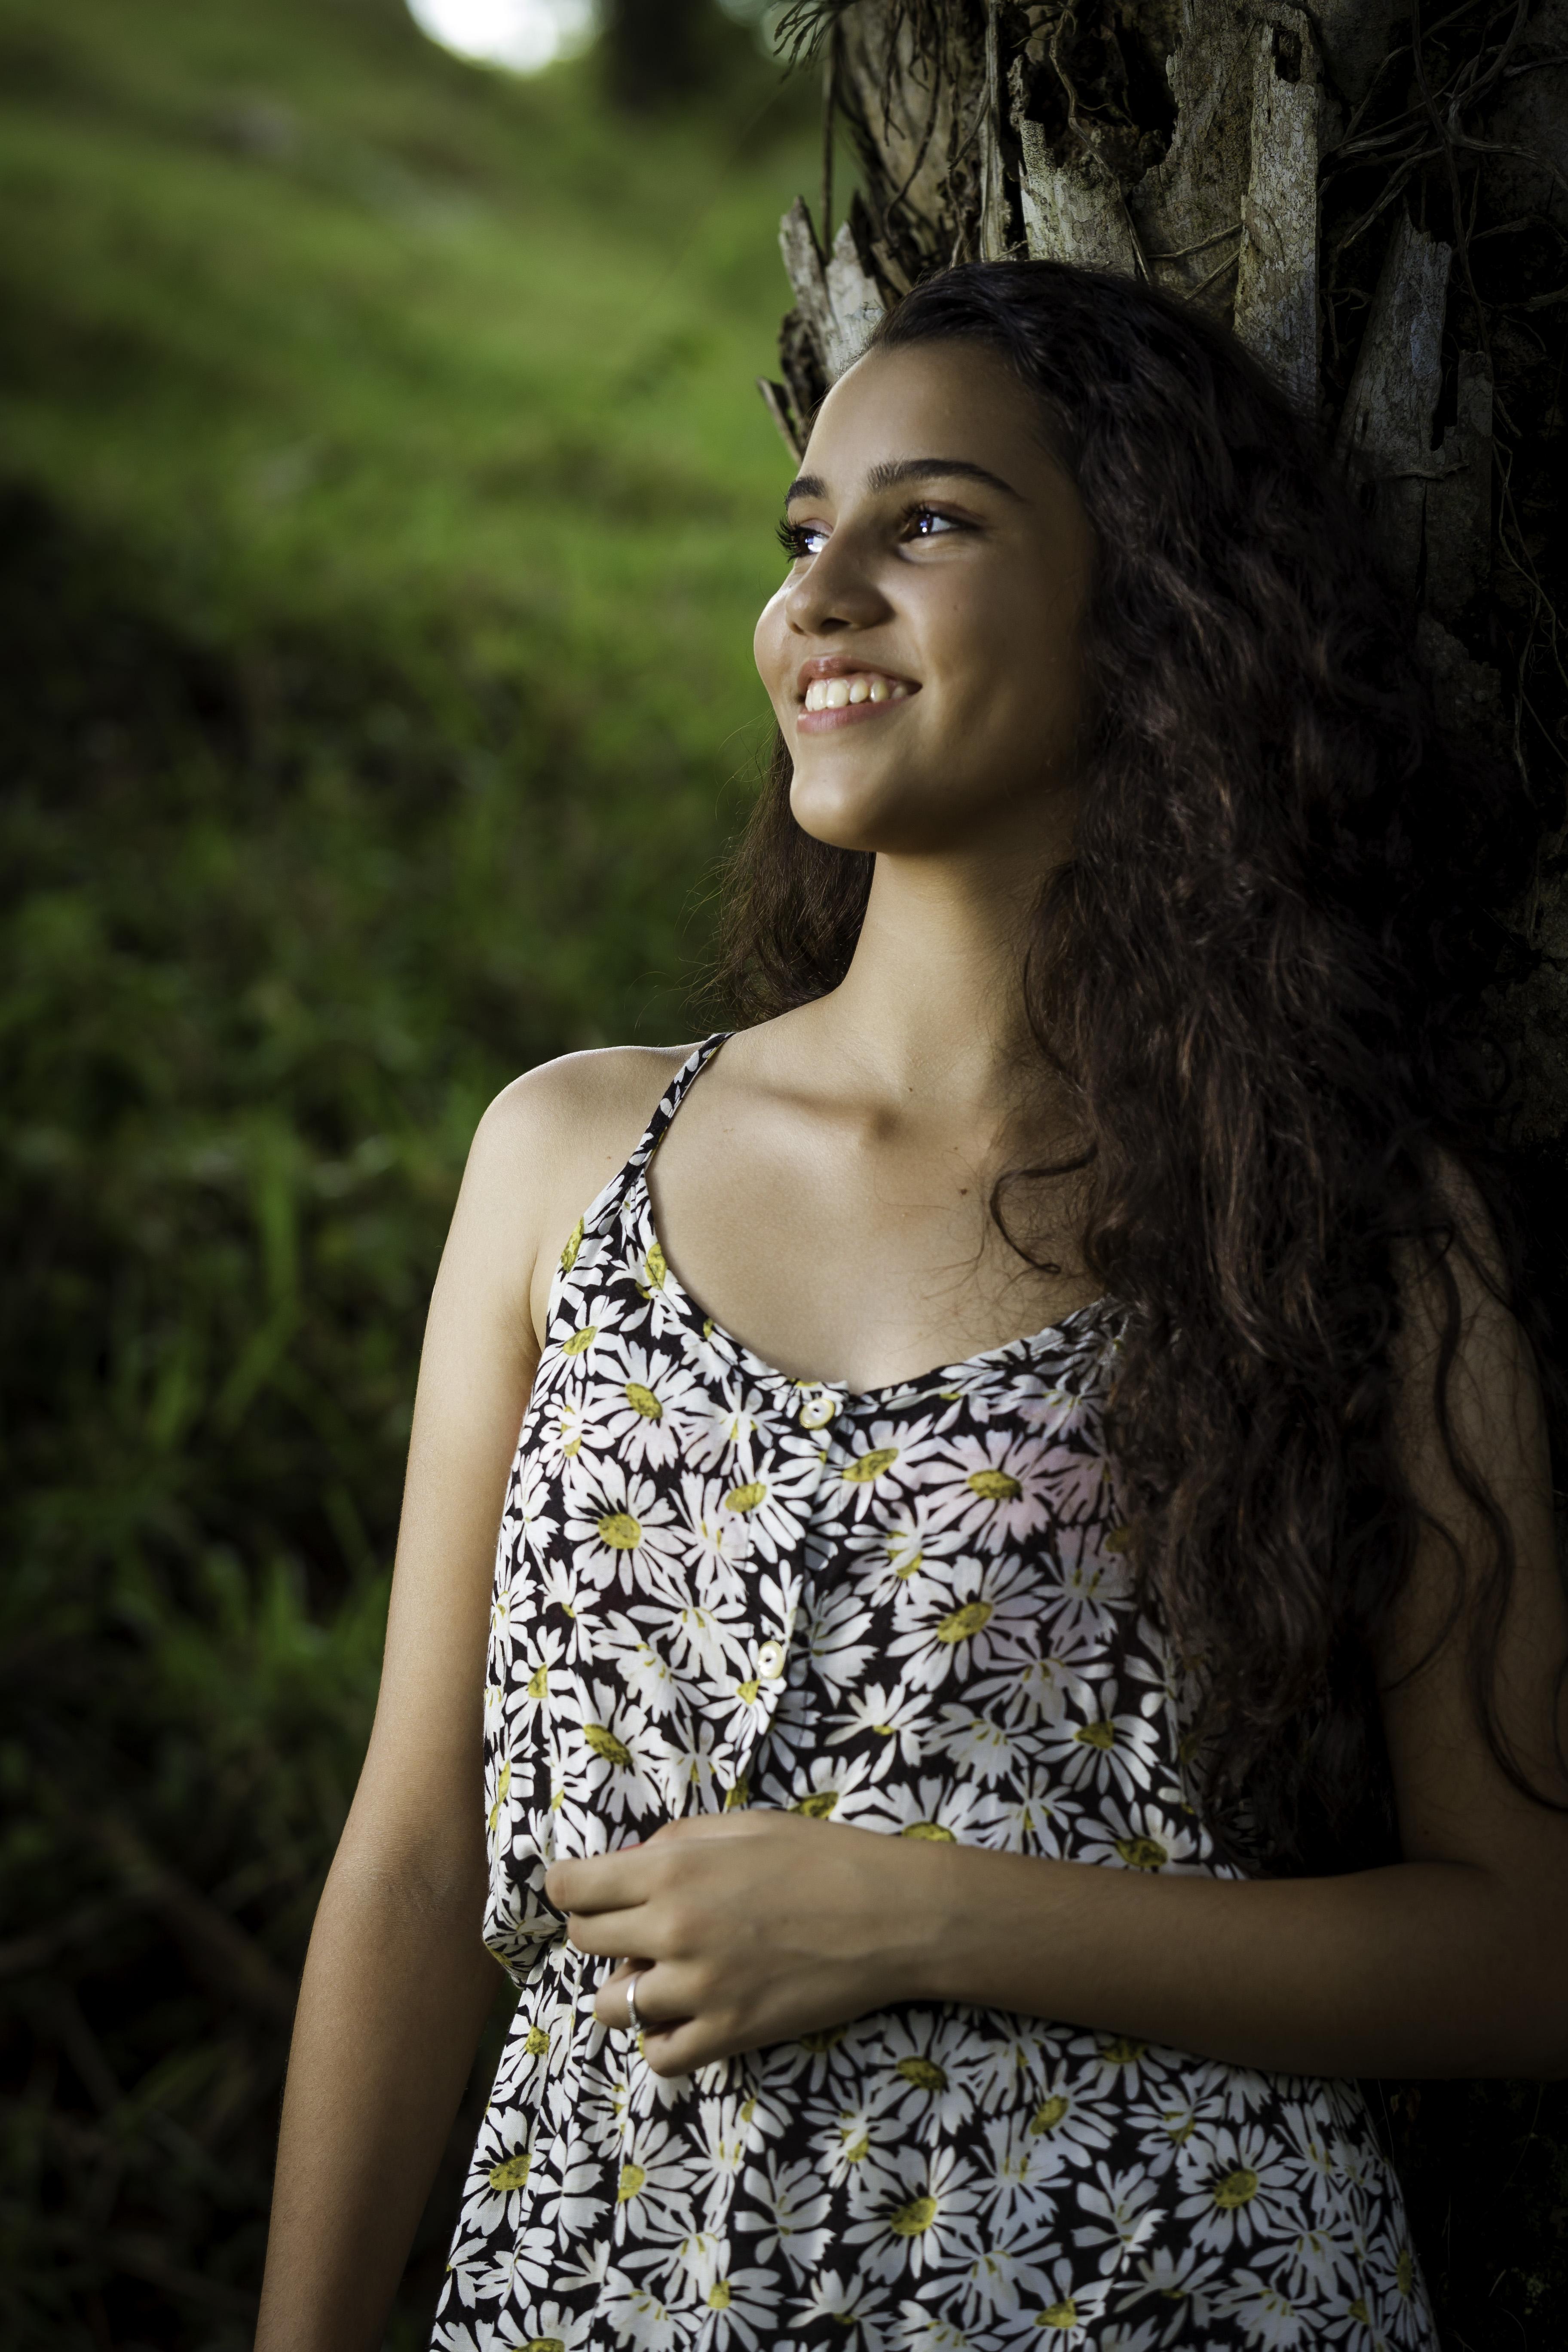 Ensaio 15 anos - Beatriz Fonseca